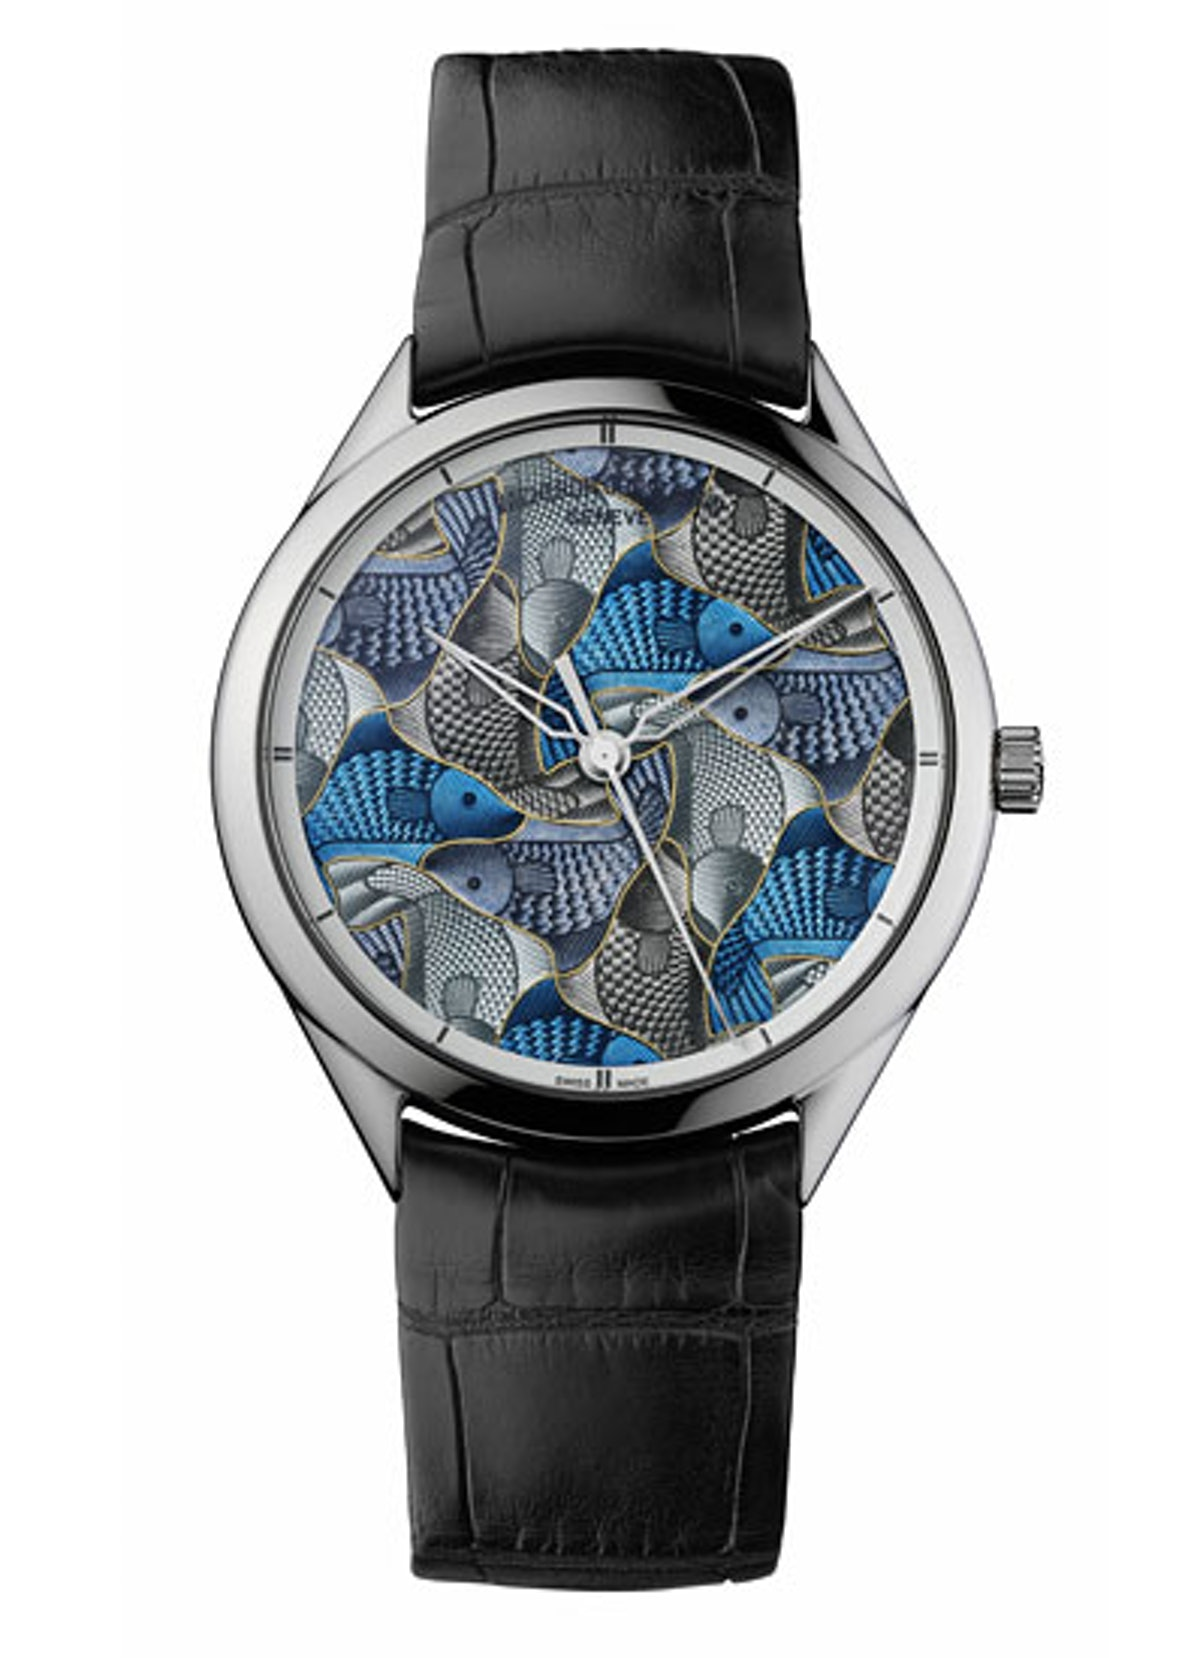 acss-geneva-watches-05-v.jpg